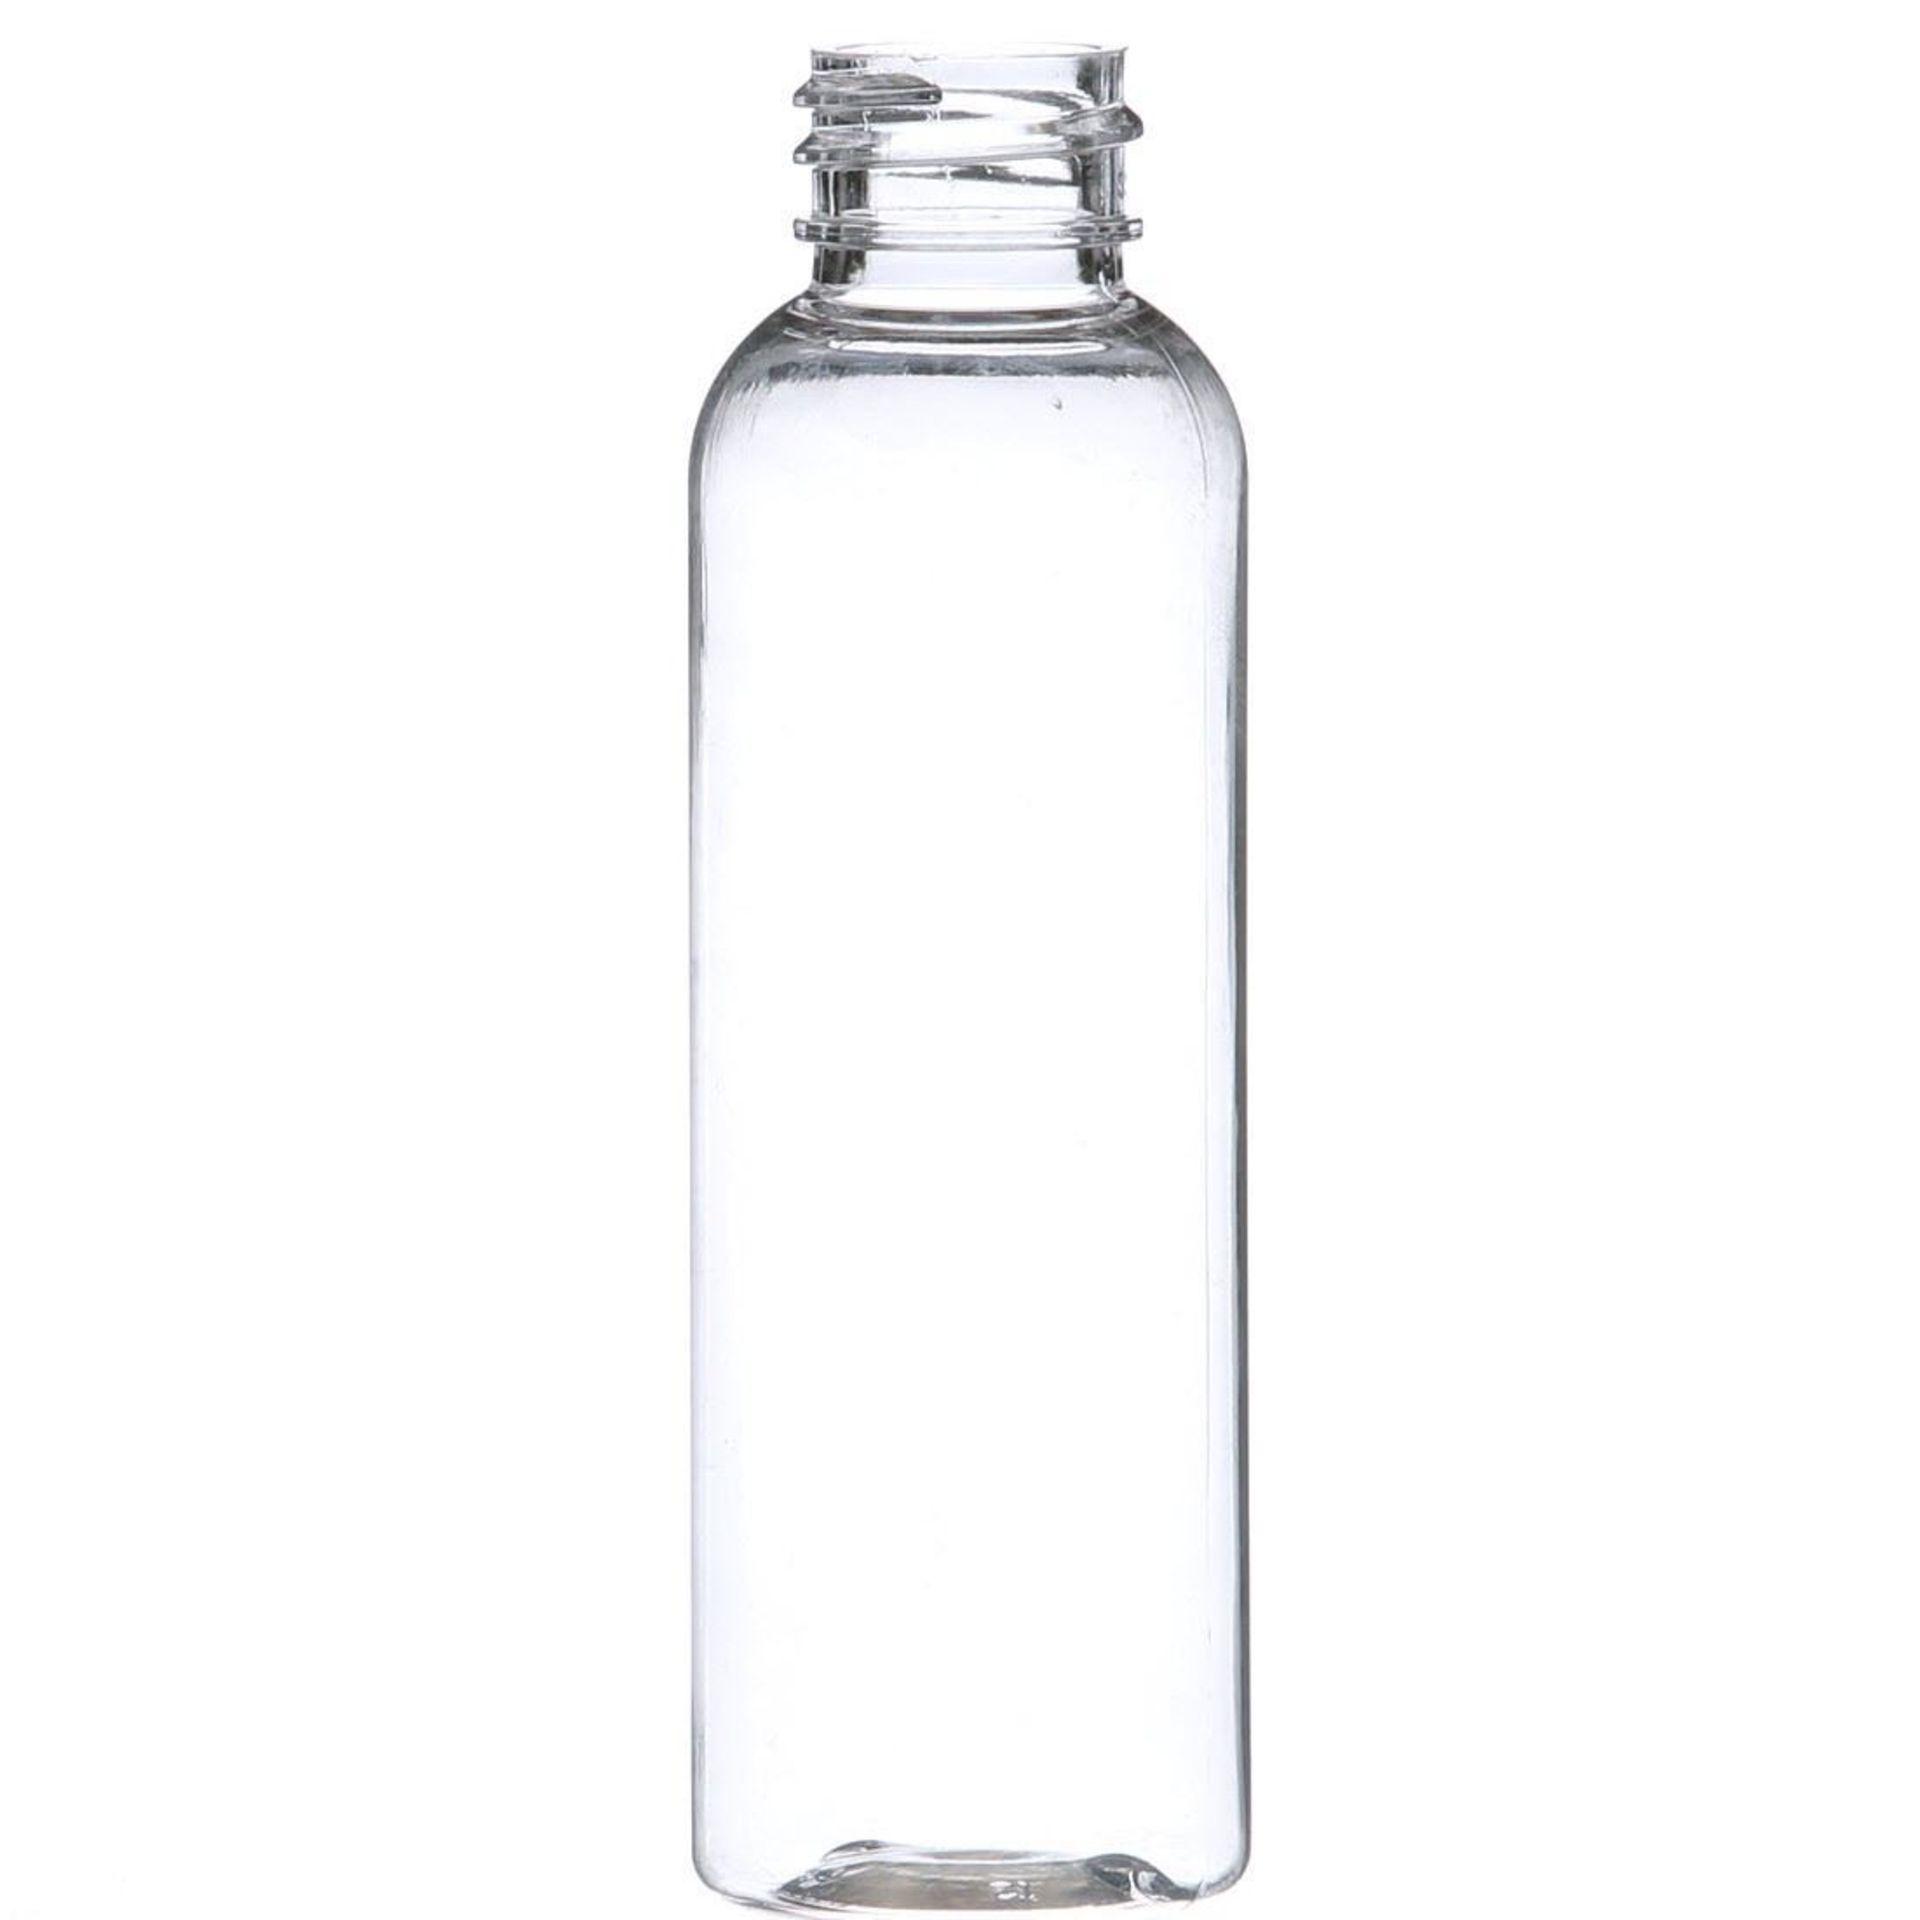 "99,500 - Clear Plastic Bullet 2 oz Empty Bottles, 18-410 Threading Neck, 4.25"" Tall 1.25"" Diameter"